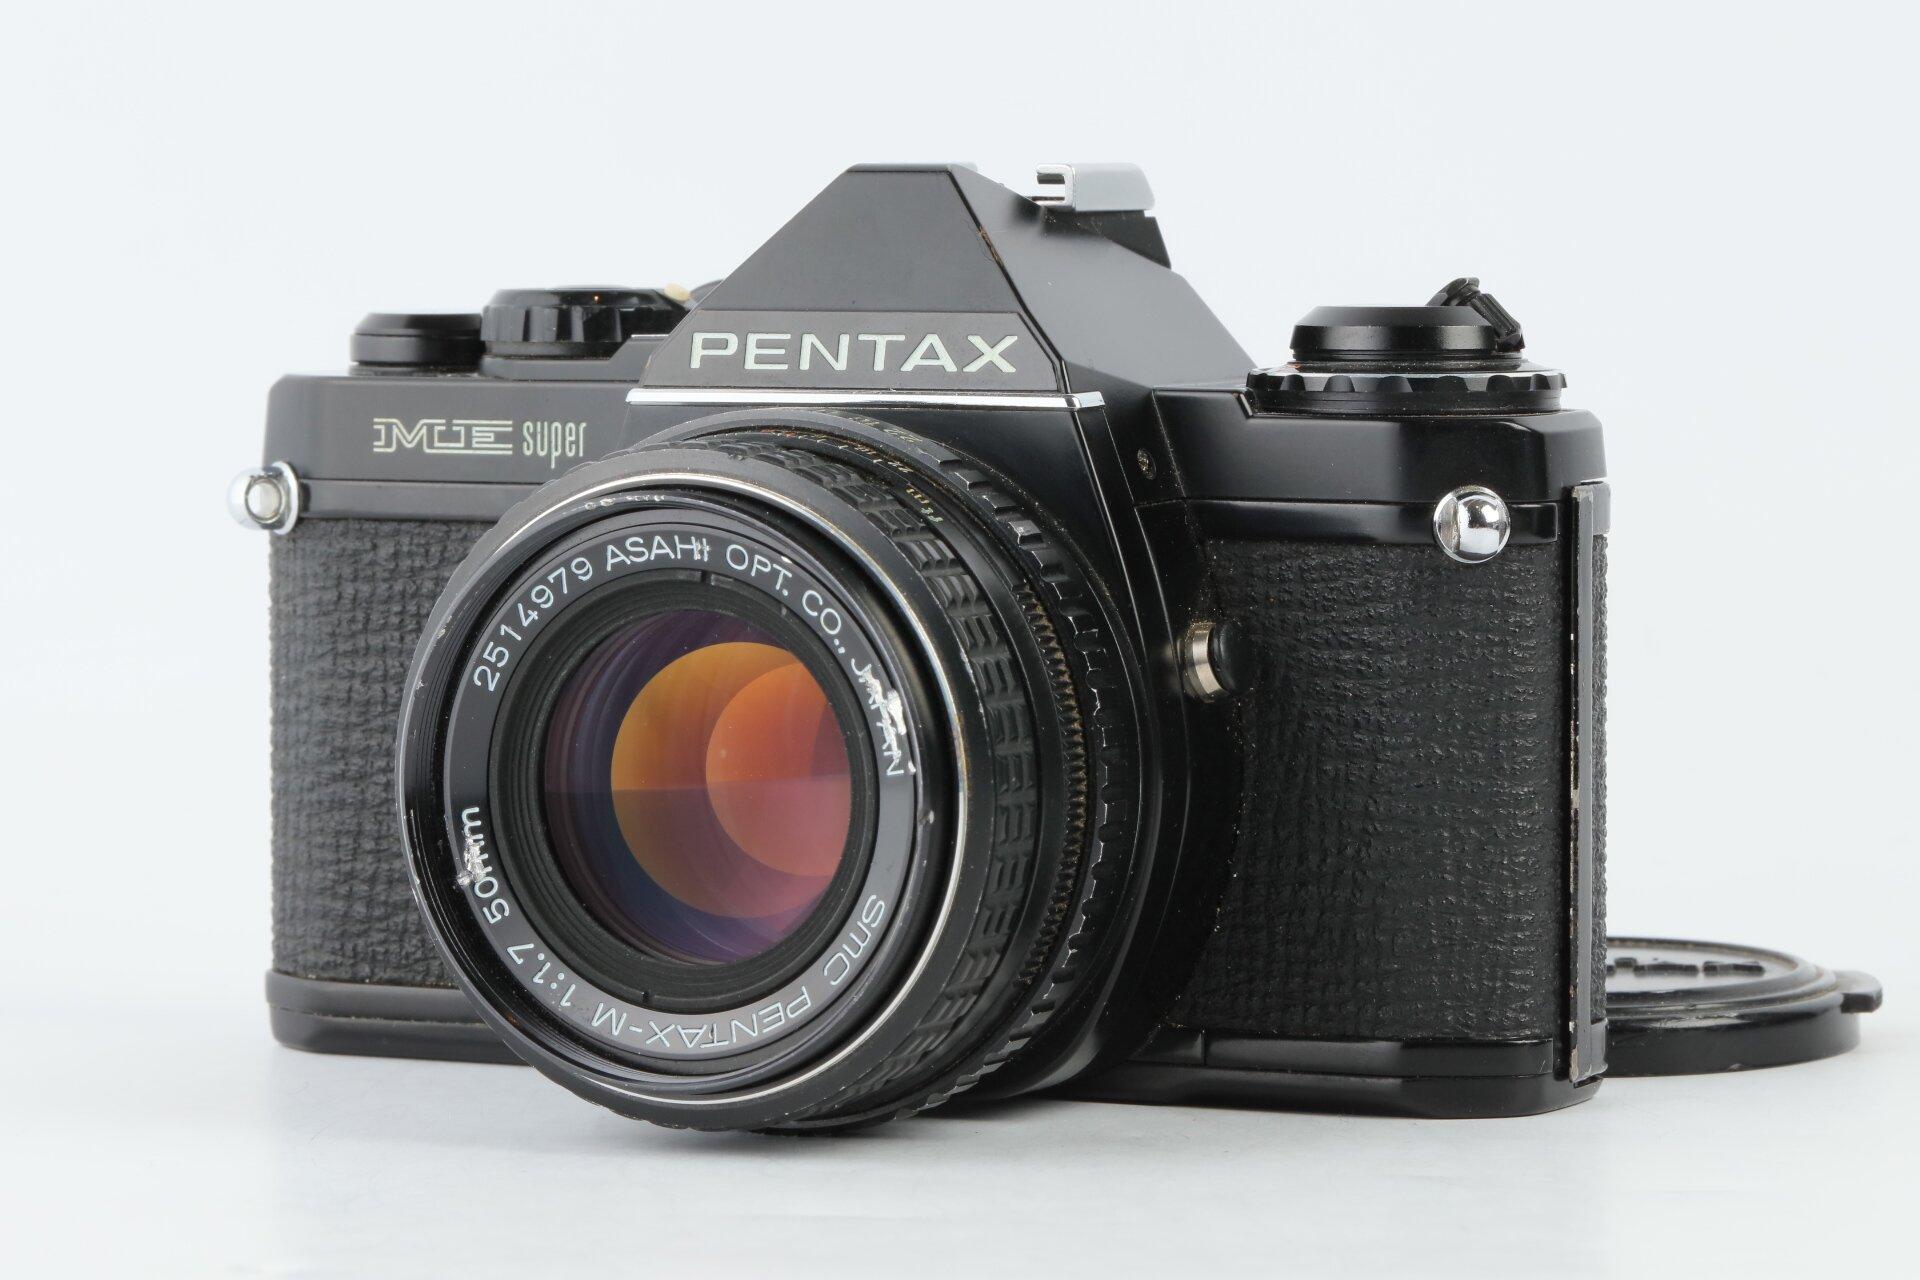 Pentax ME Super mit Pentax-M 1,7/50mm SMC